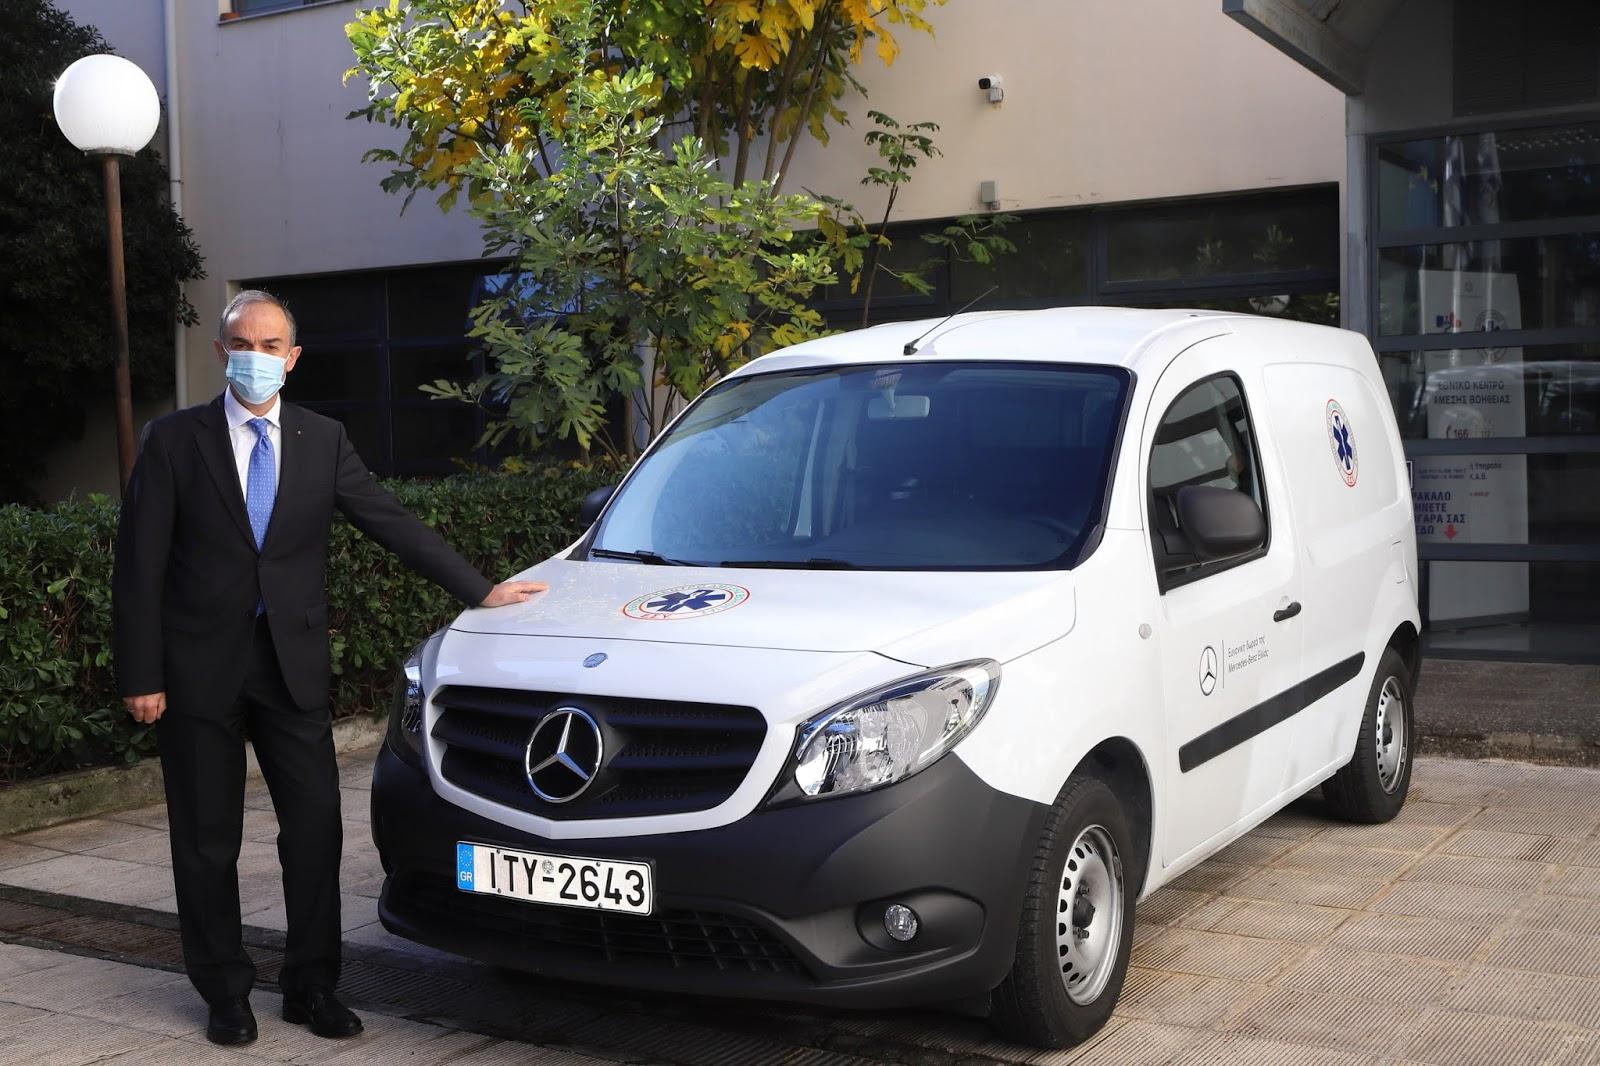 IMG 5164 Η Mercedes-Benz συνεχίζει να προσφέρει έμπρακτα, στο Εθνικό Κέντρο Άμεσης Βοήθειας.